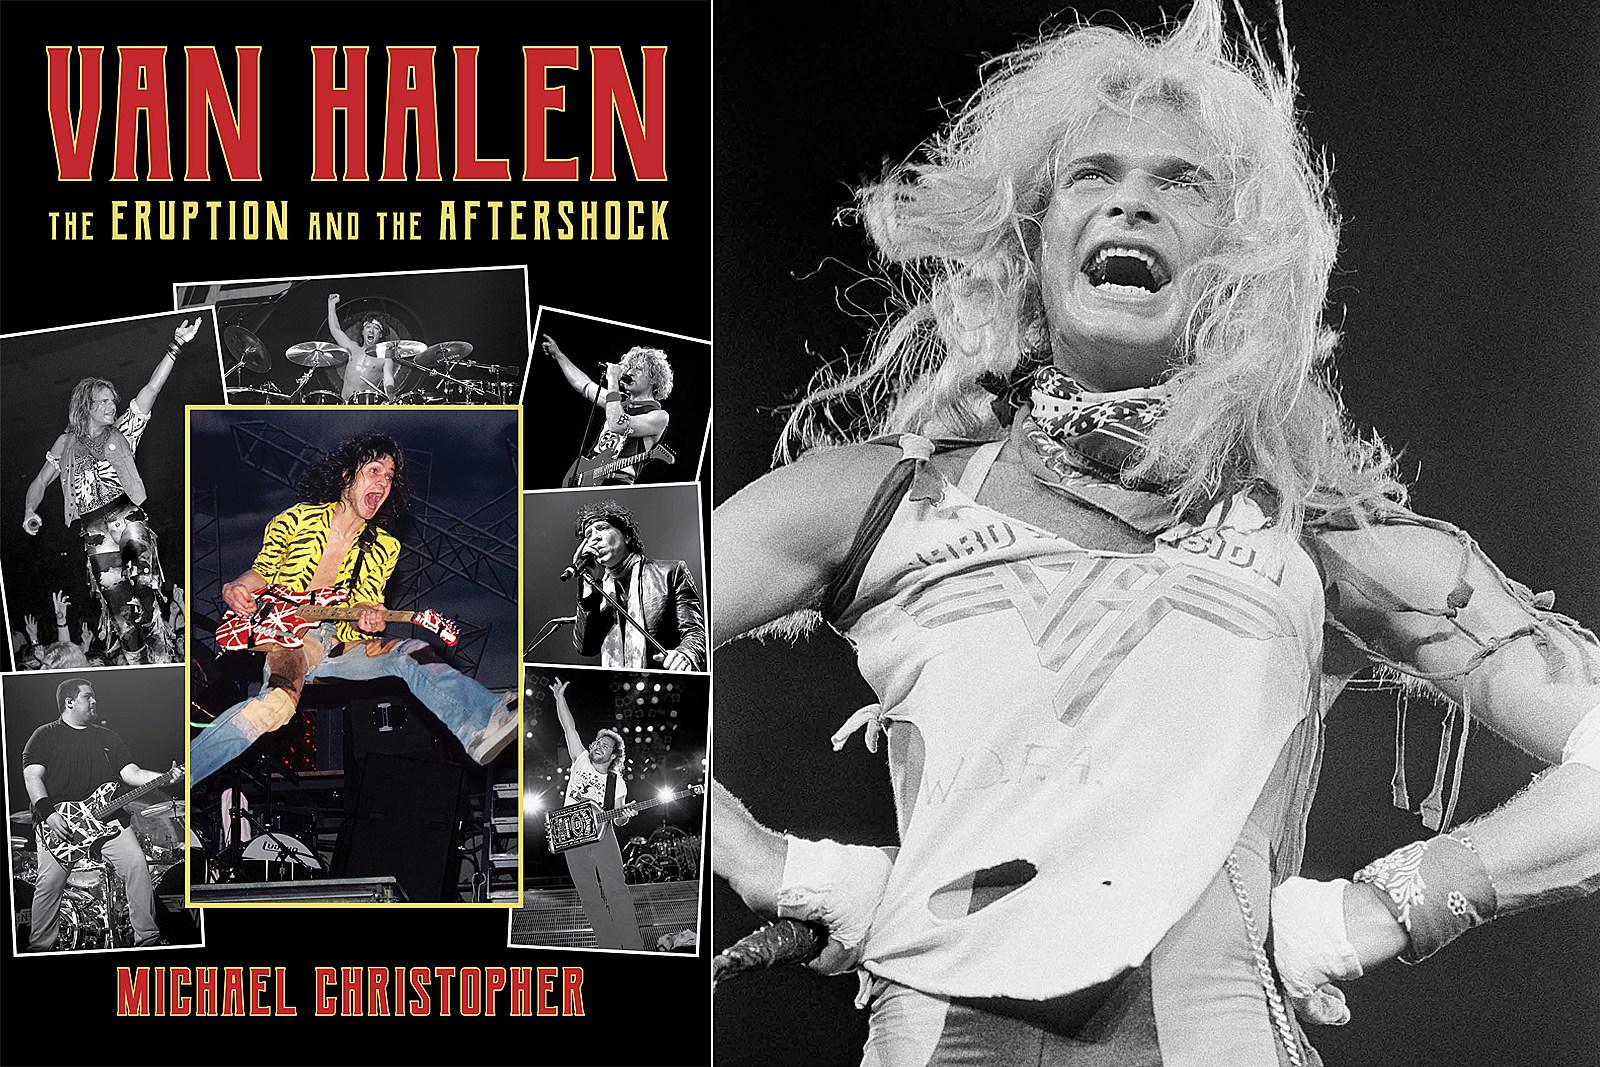 When David Lee Roth Was Arrested on 1980 Van Halen Tour: Excerpt